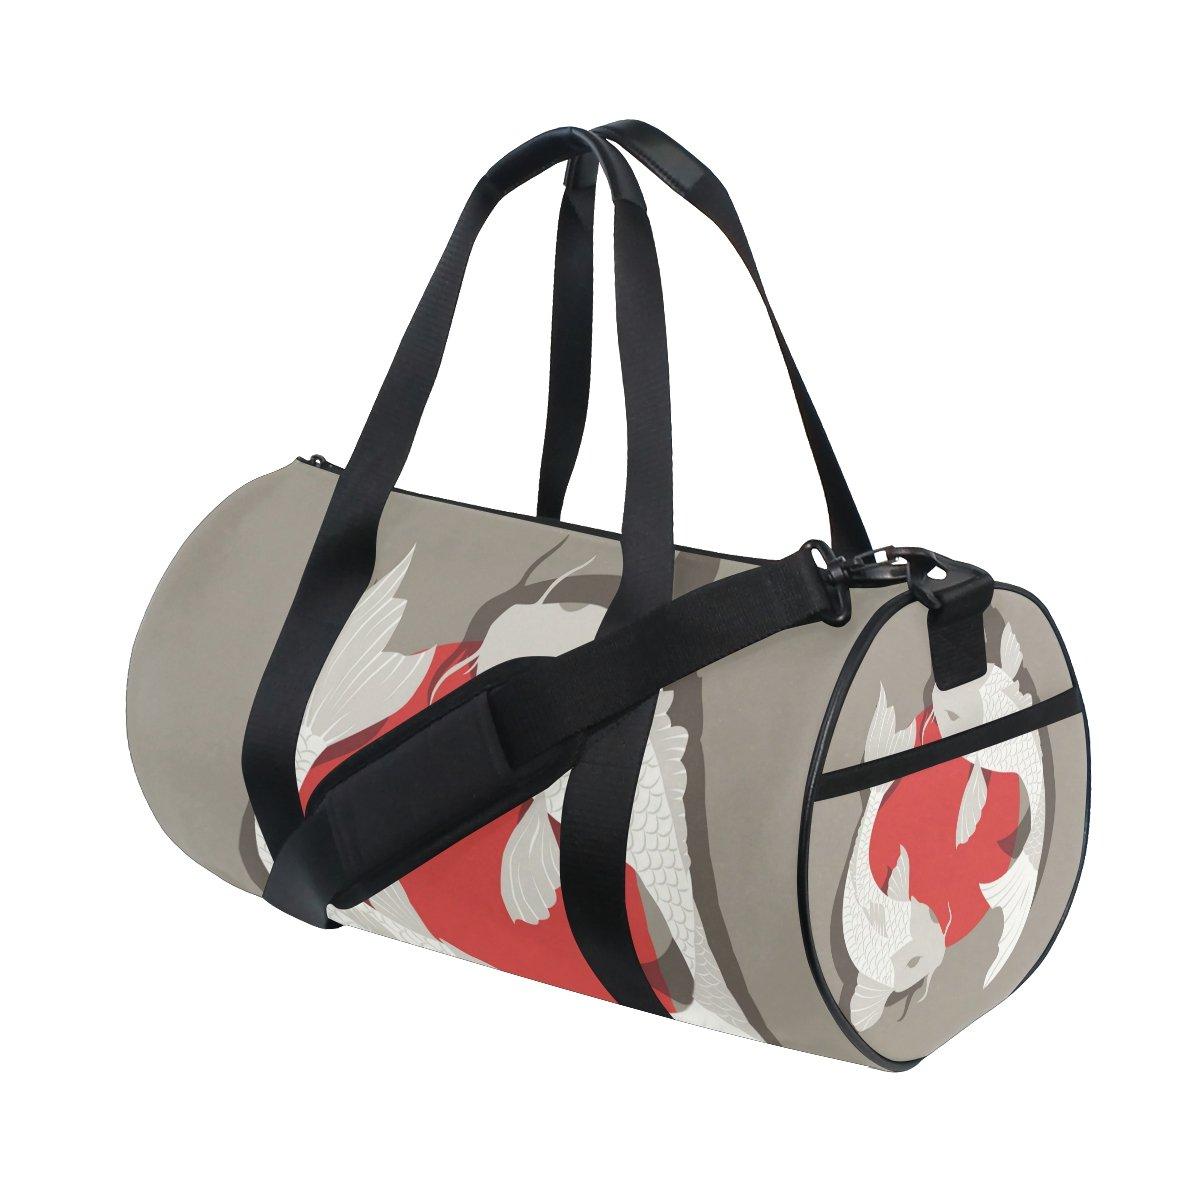 Japanese Koi Fish Travel Duffel Shoulder Bag ,Sports Gym Fitness Bags